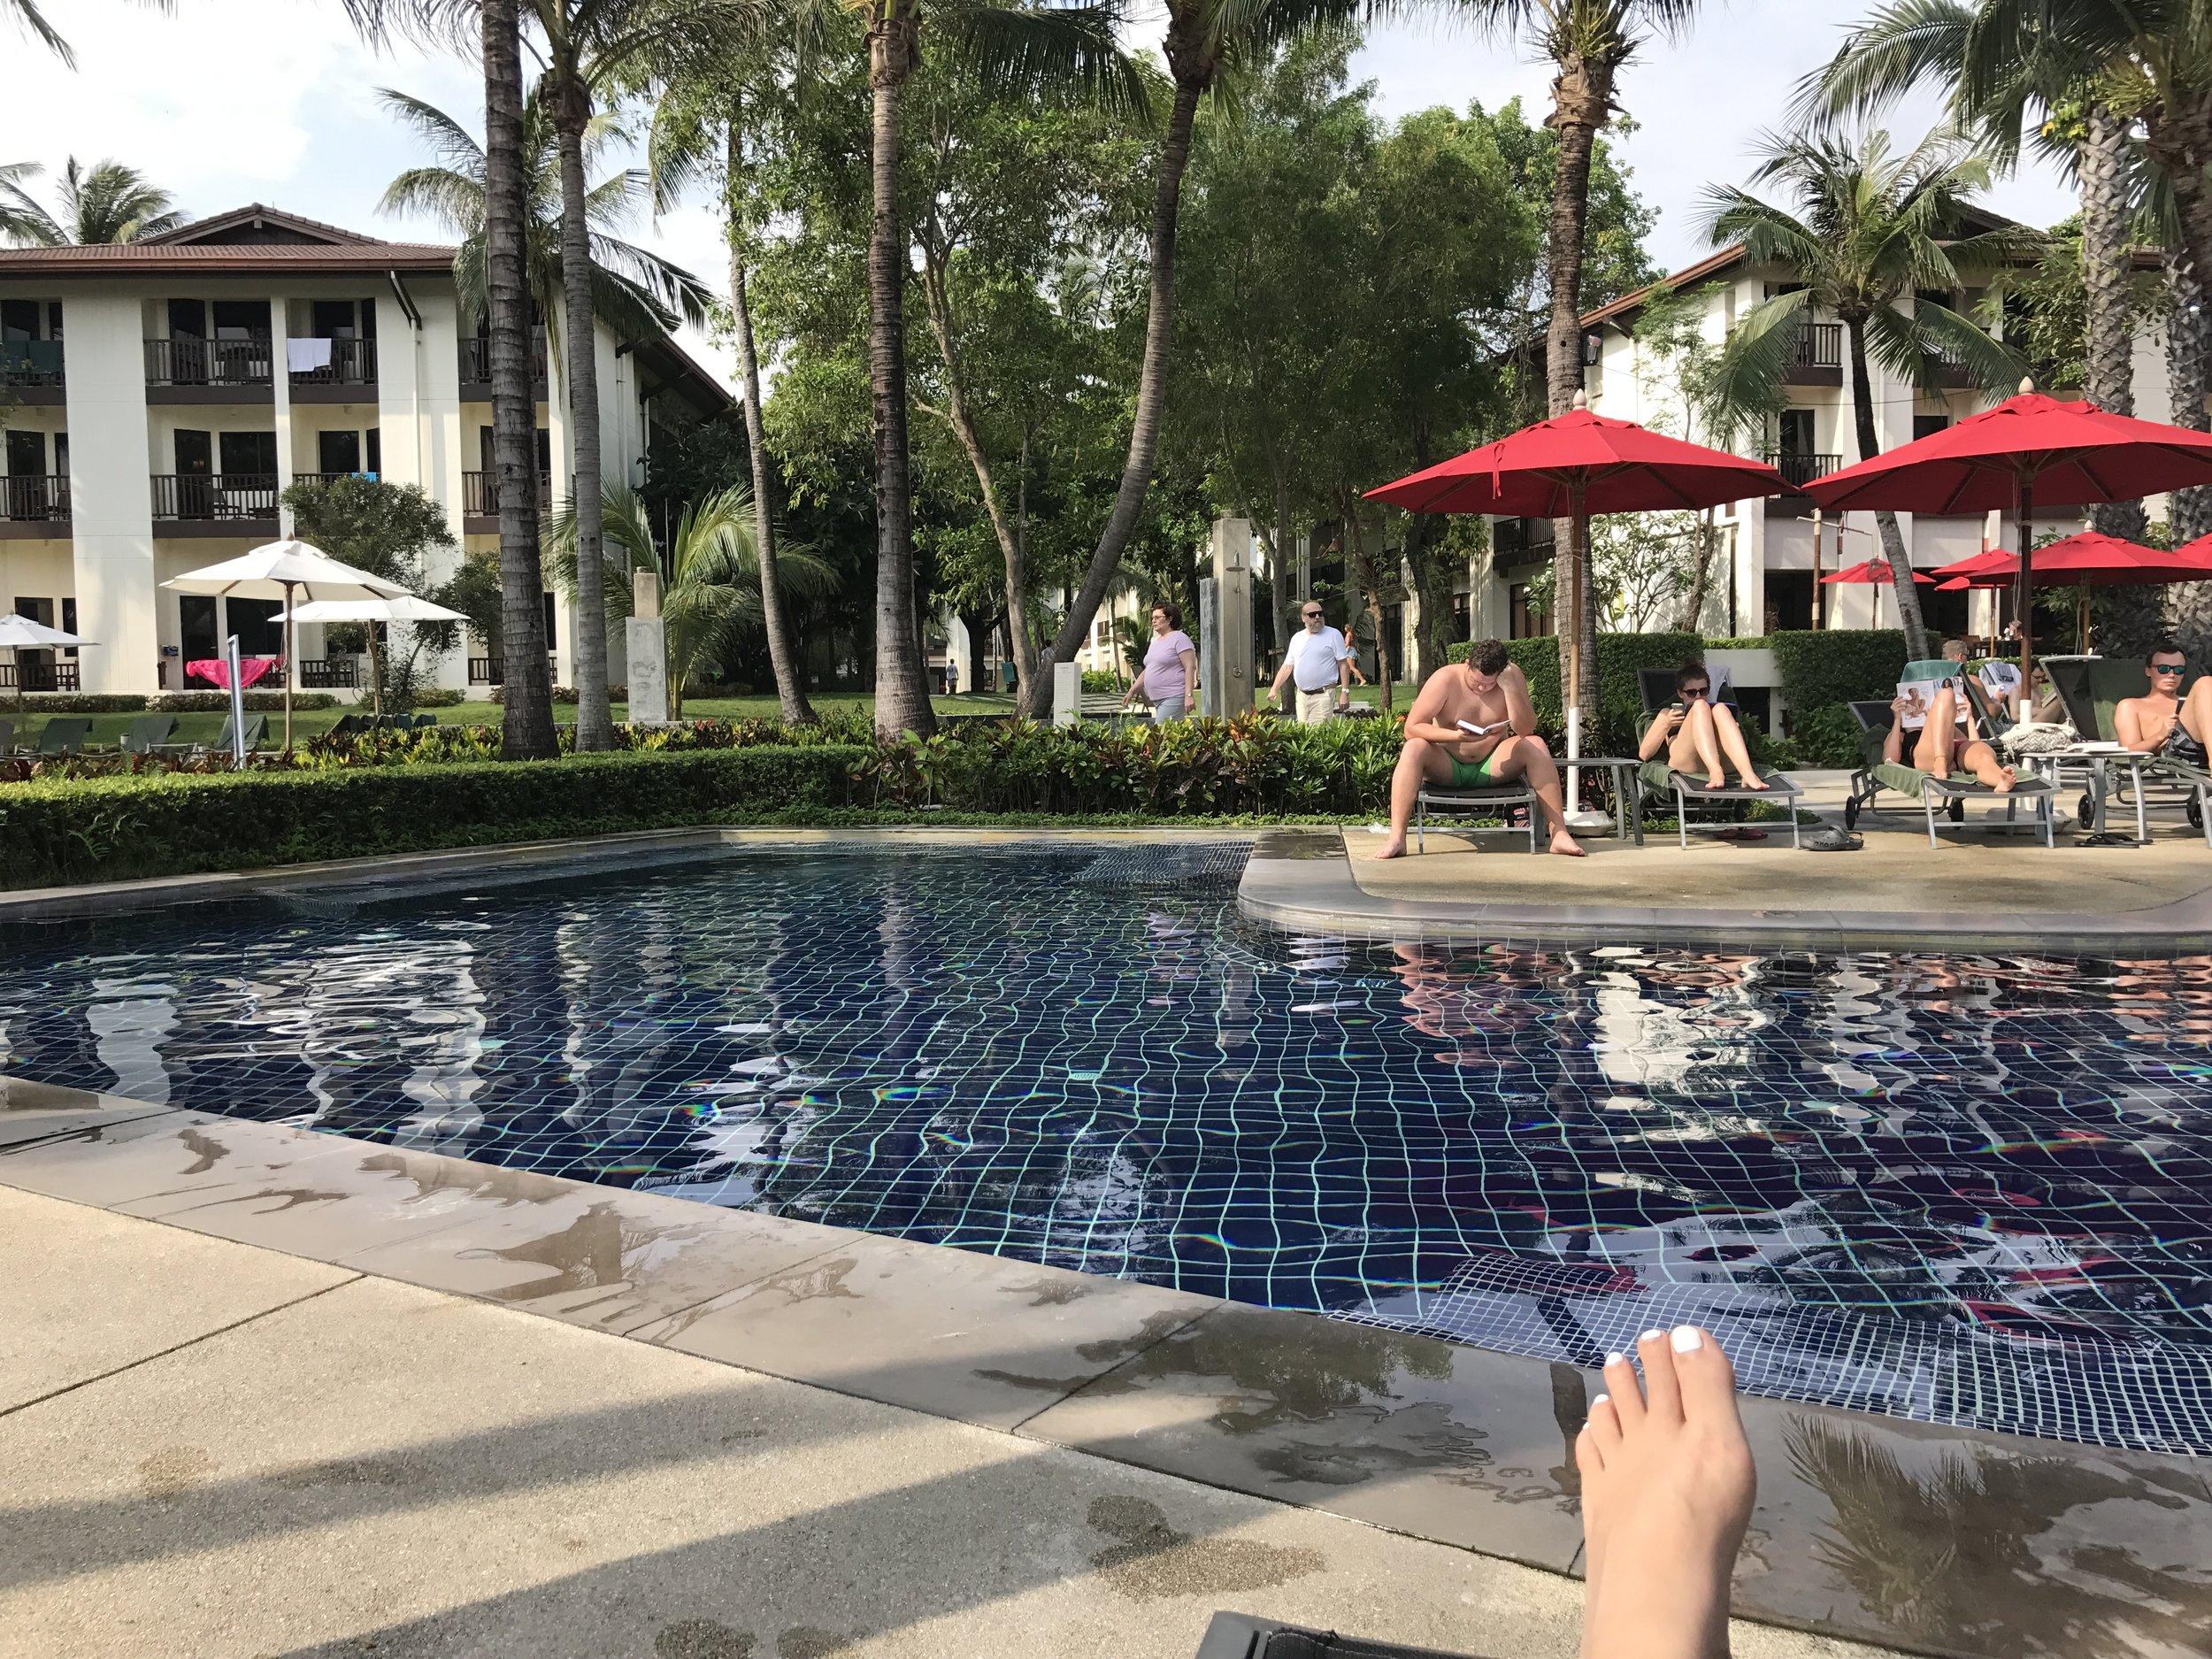 Pool at the Ibis Resort, Koh Samui.